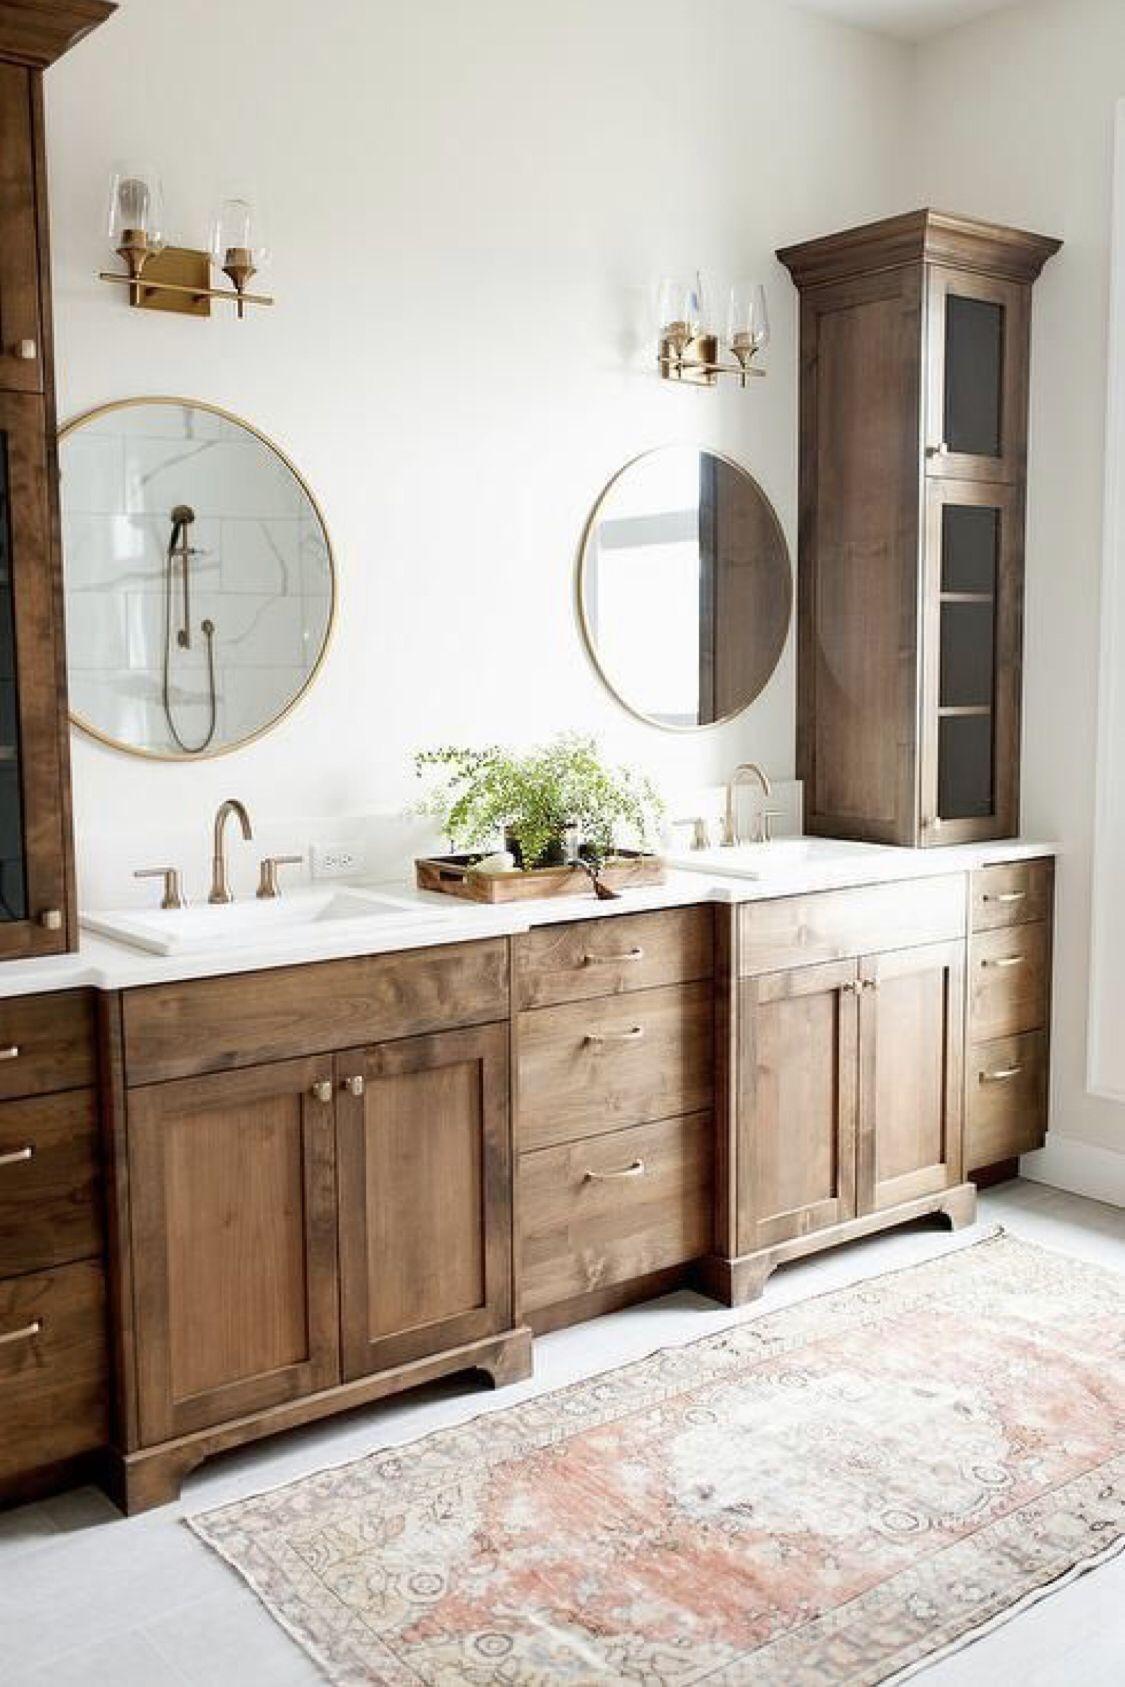 Master Bathroom Vanity Bathroom Decor Home Bathrooms Remodel [ 1687 x 1125 Pixel ]